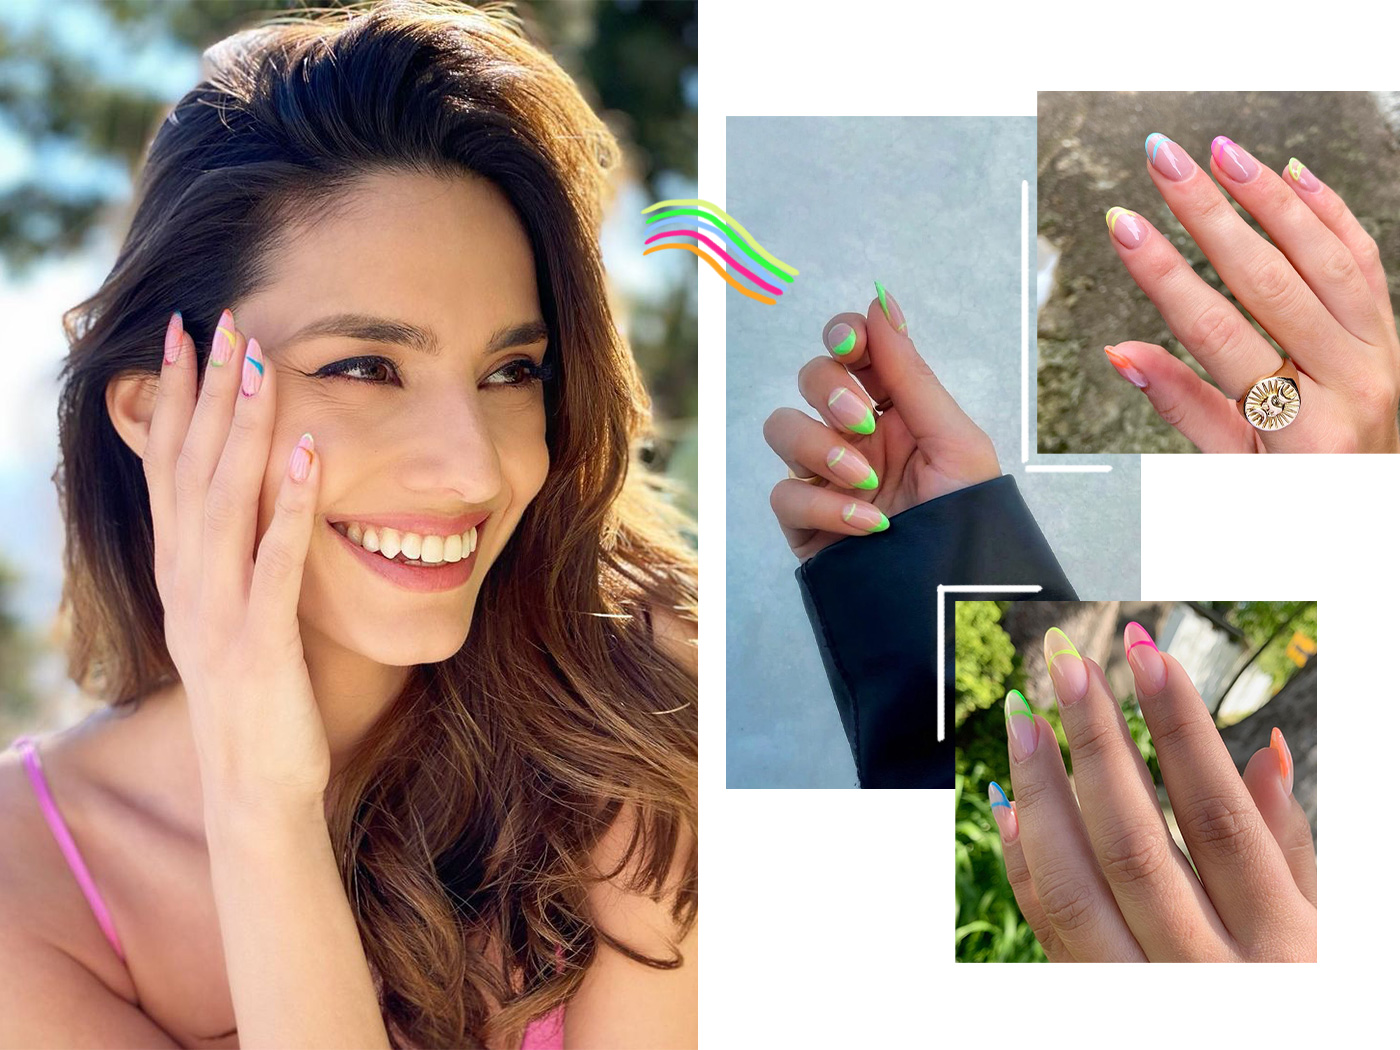 Neon French Twist: τα νύχια της Ηλιάνας Παπαγεωργίου είναι η μεγαλύτερη τάση του καλοκαιριού